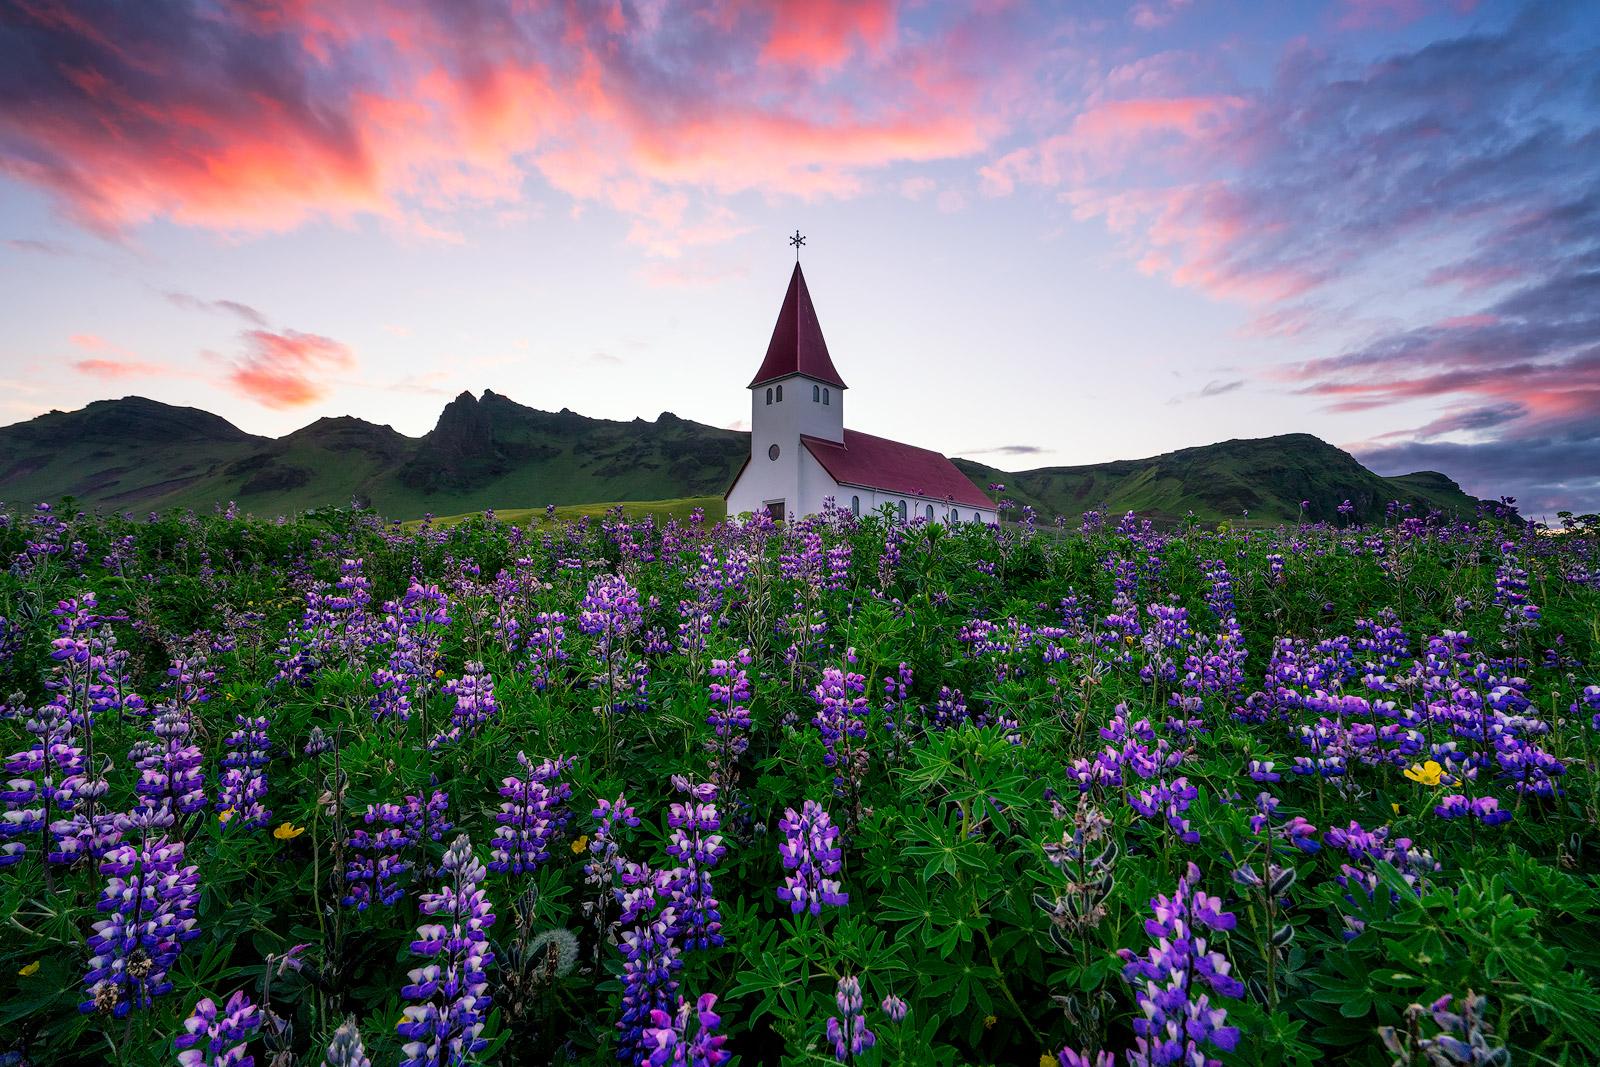 Izland tavasz Vik